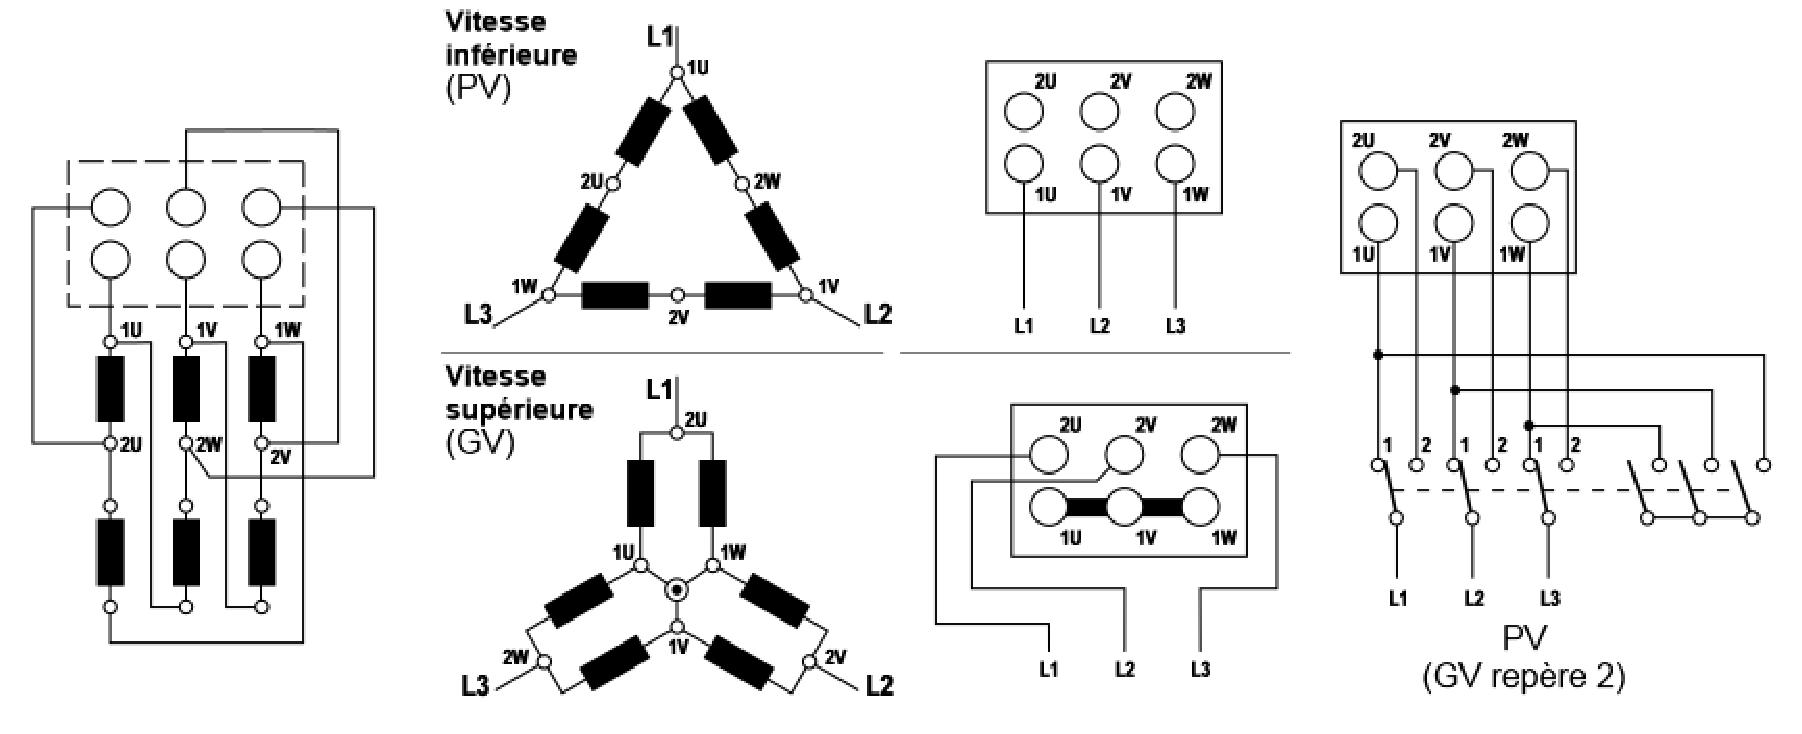 4404161396194273558?resize\\\\\\\\\\\\\\\\\\\\\\\\\\\\\\\=665%2C271 lenel 2210 wiring diagrams wiring diagrams Zetron Hooks into a Motorola Base Radio at reclaimingppi.co